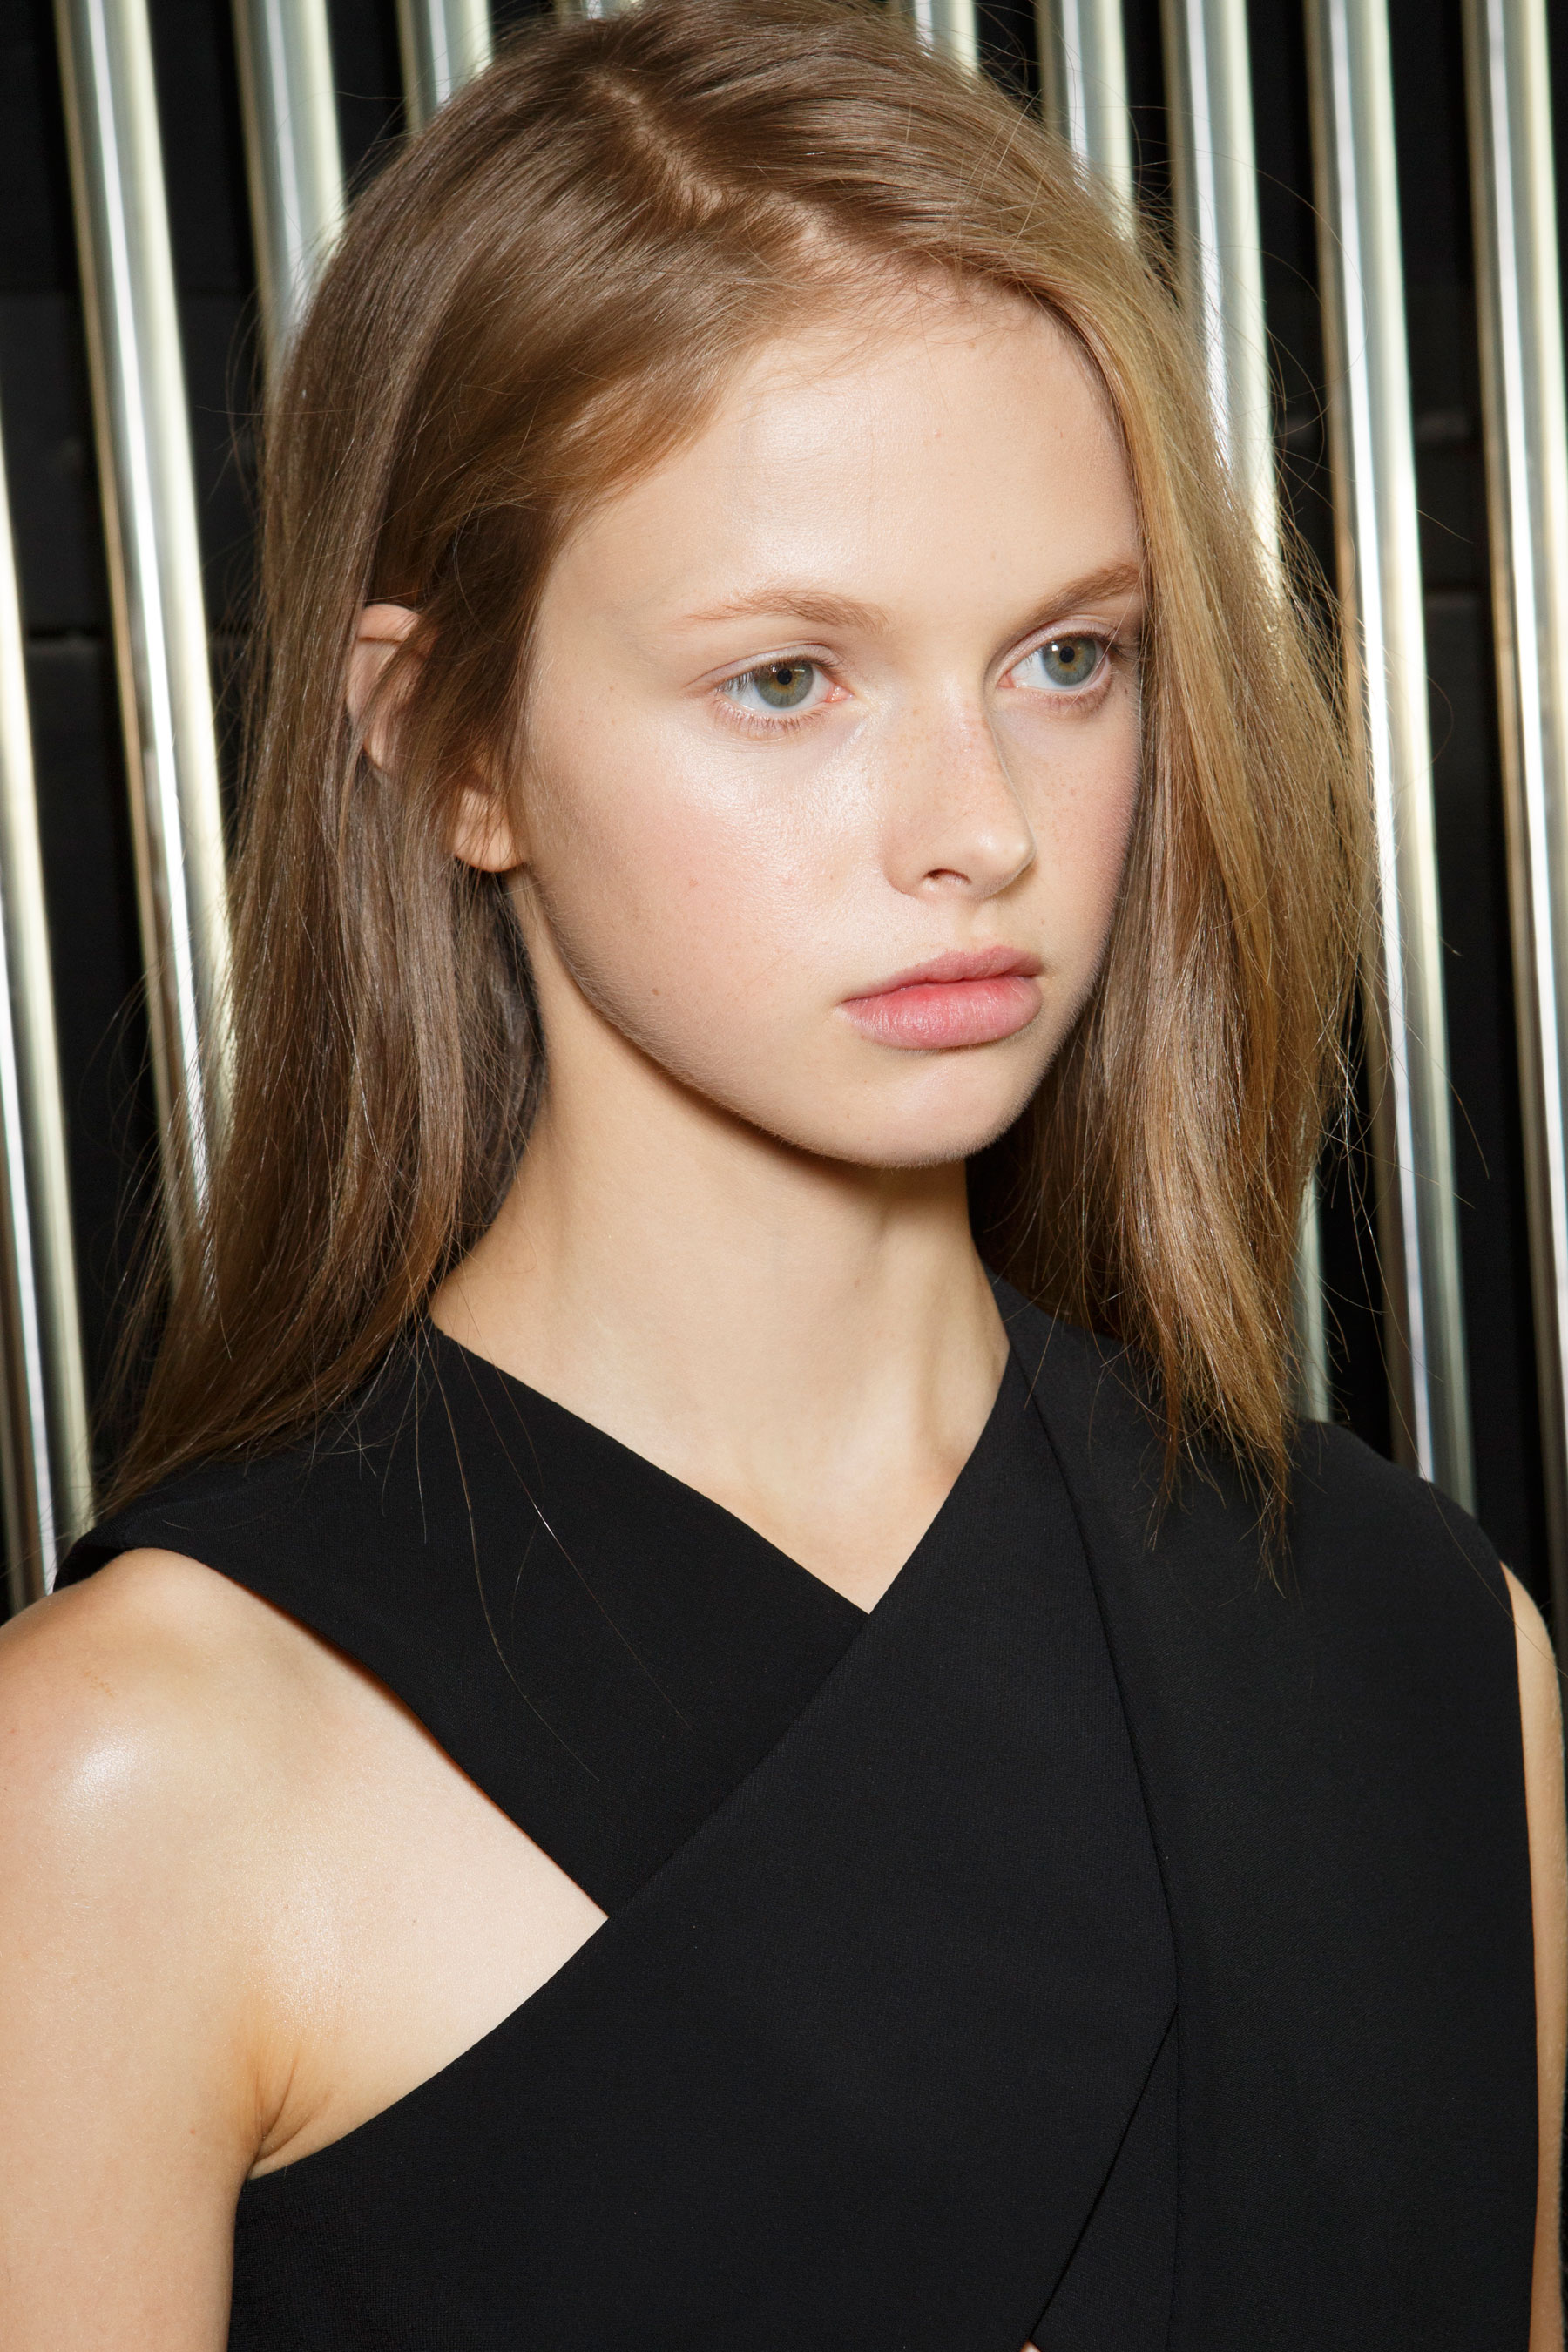 Preen-by-Thornton-Bregazzi-beauty-spring-2016-fashion-show-the-impression-001